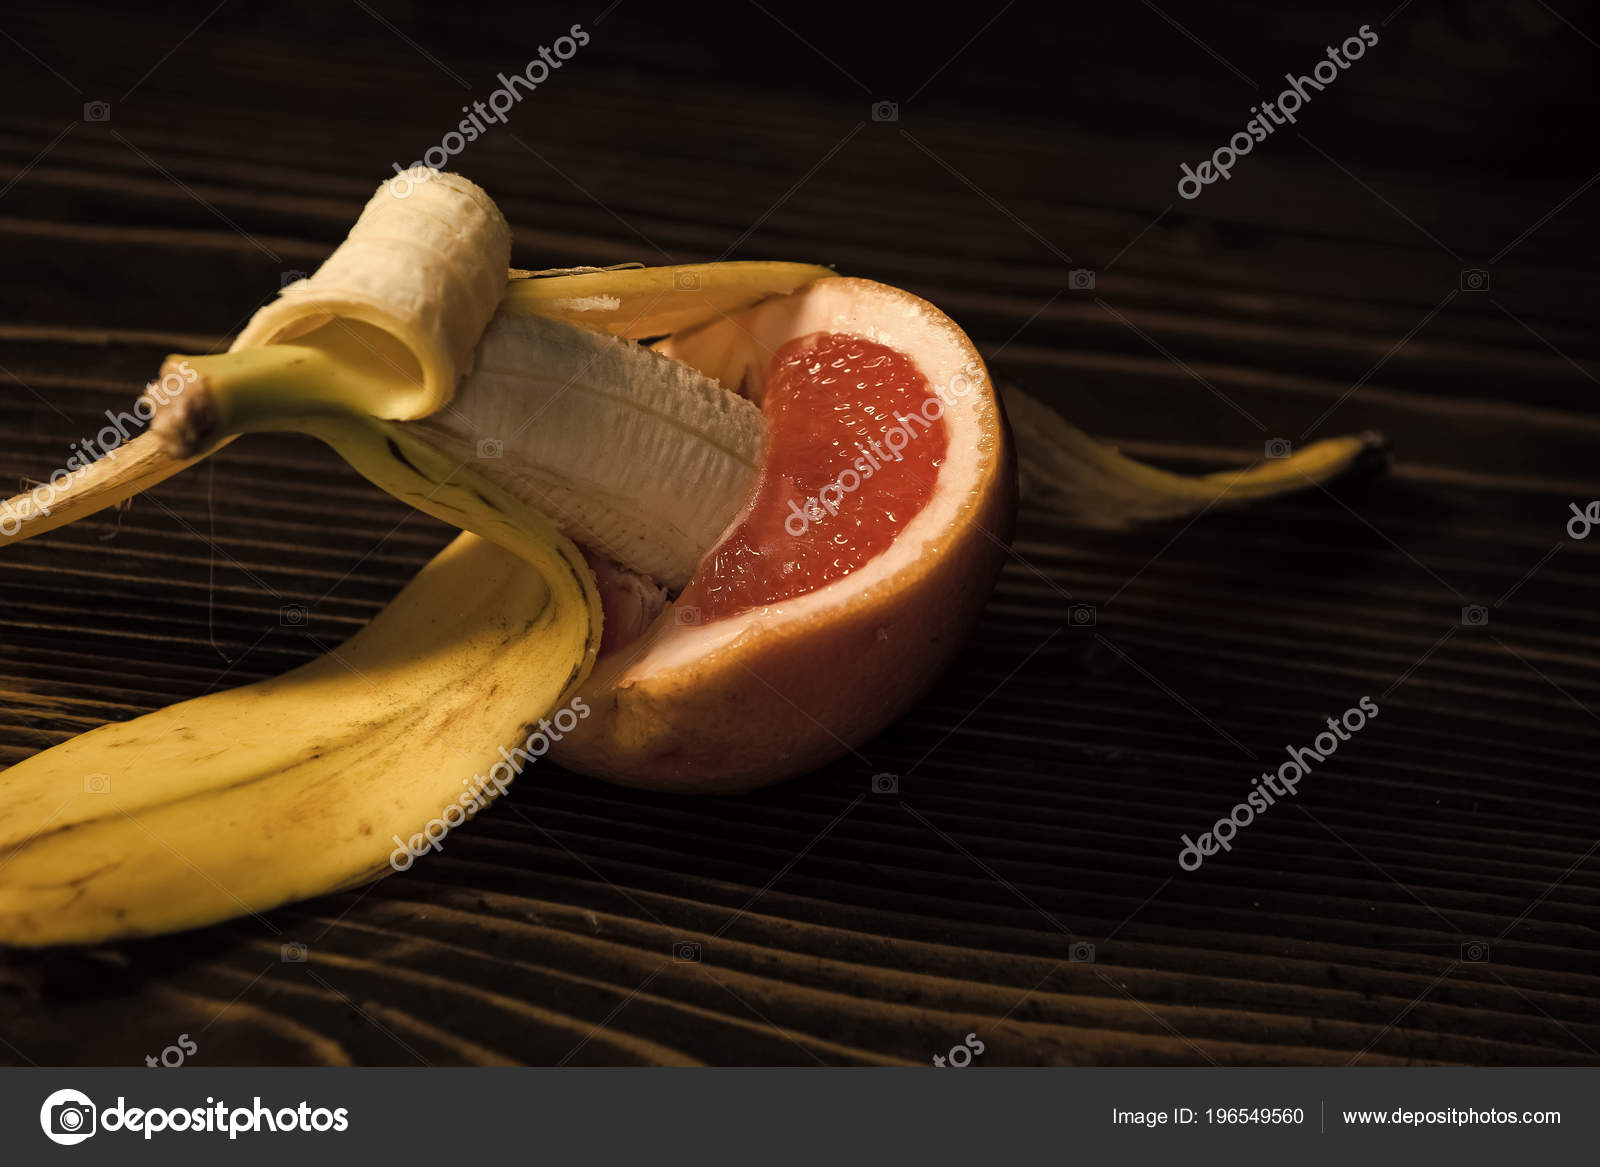 Šťavnaté obrázky vagíny